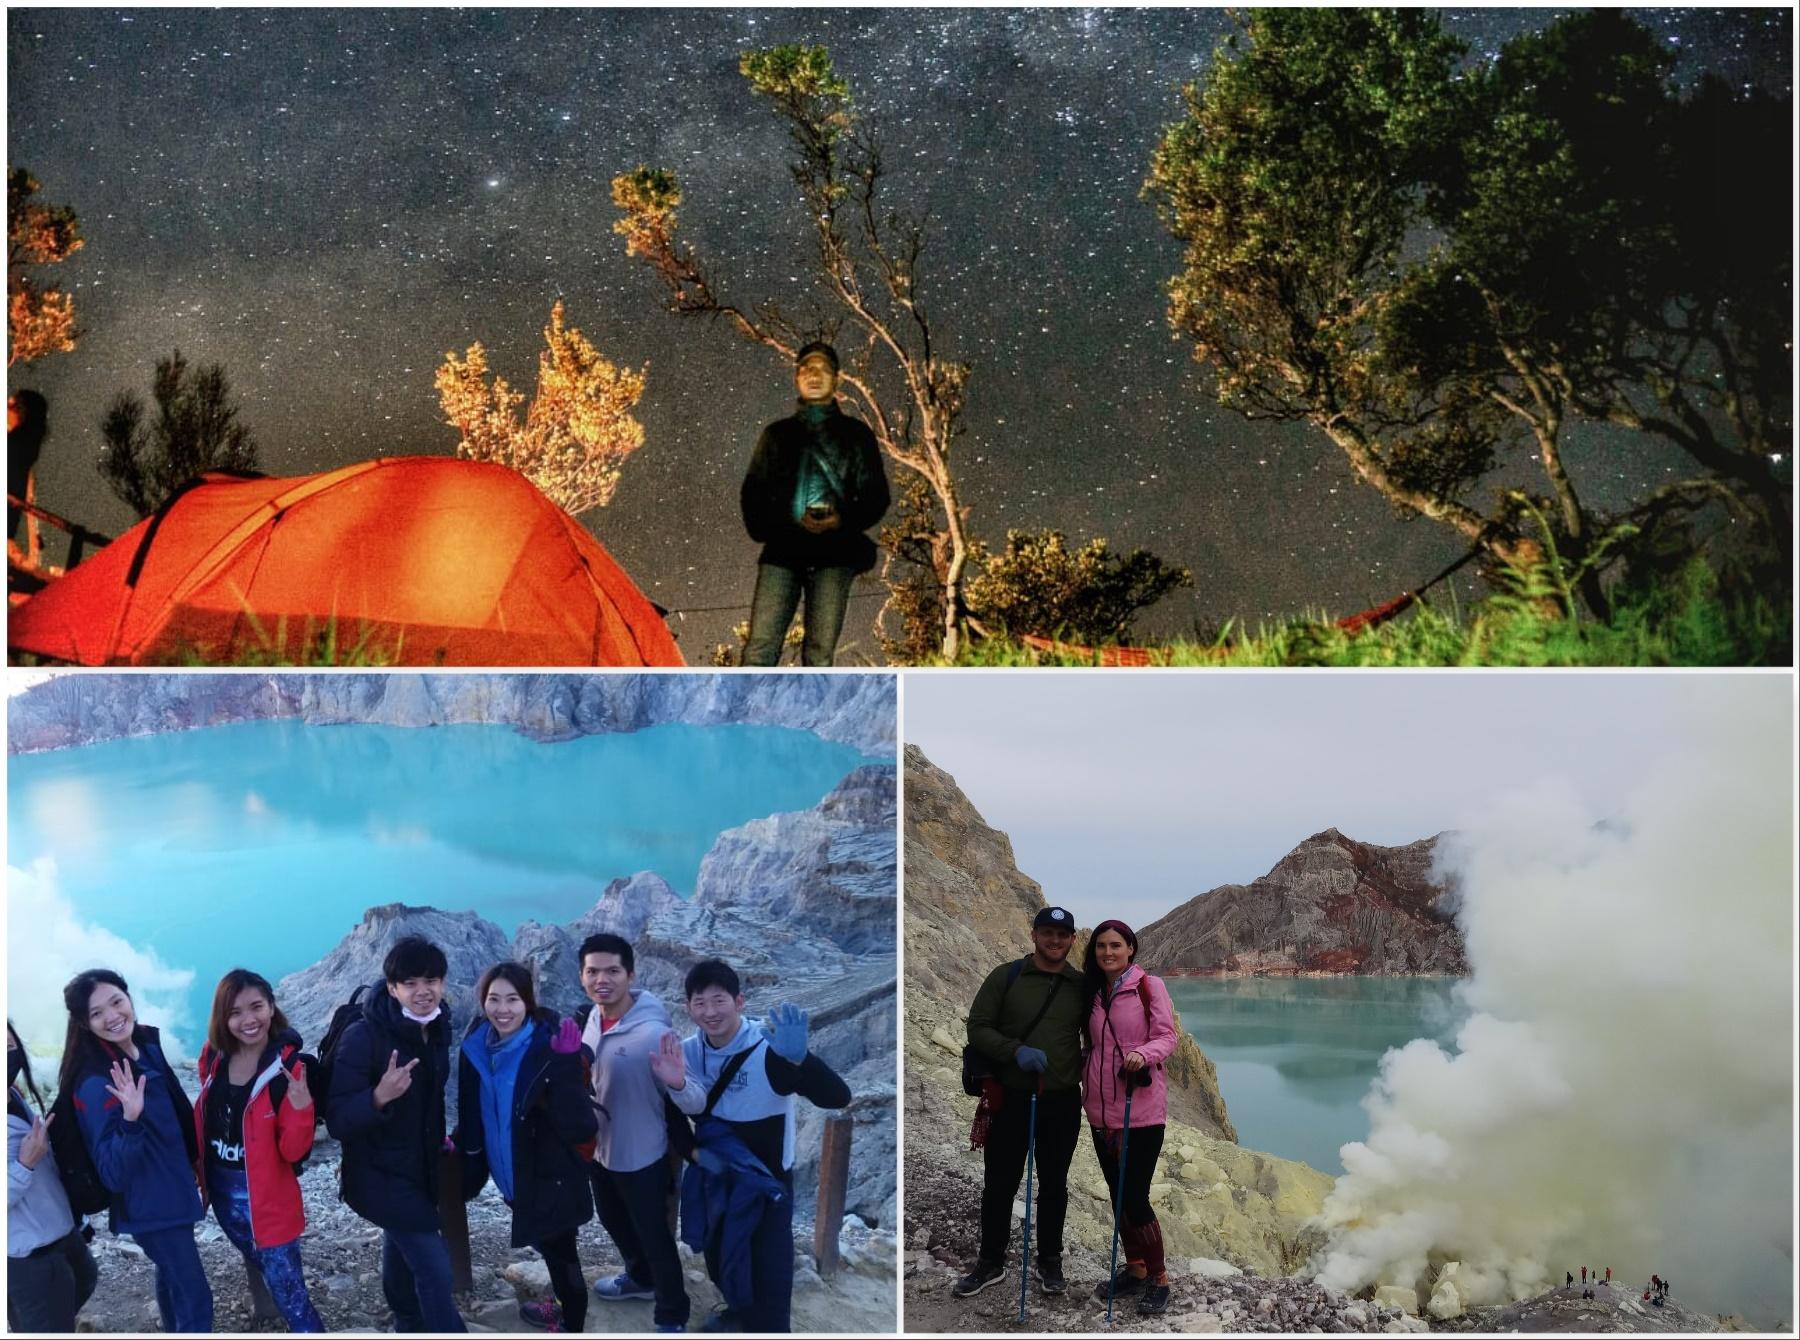 Mount Bromo Milky Way, Ijen Crater tour 3 days 2 nights